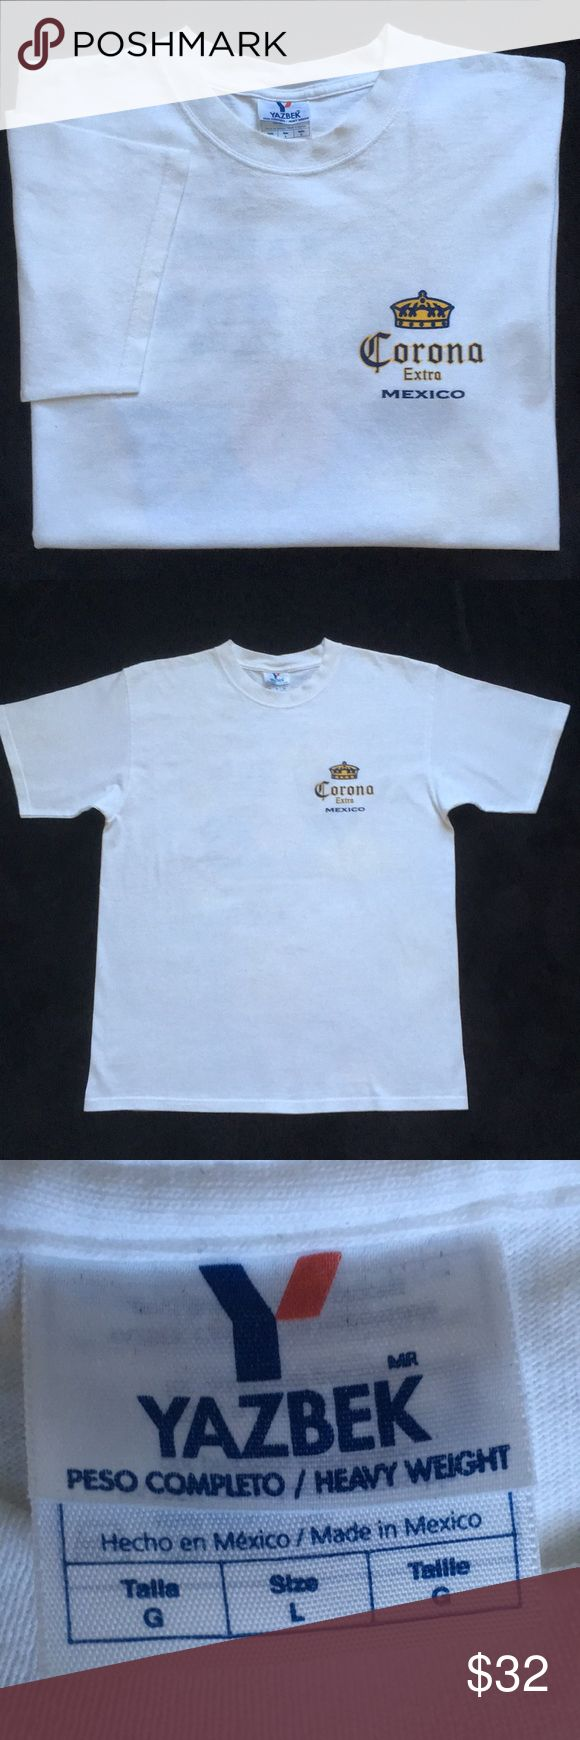 "🍻NEW🍻Corona Extra Mexico Beach Club T-Shirt Sz L 🍻NEW🍻Corona Extra Mexico Life's A Beer Corona Beach Club Heavy Weight T-Shirt Size Large. Tee Shirt Manufactured by Yazbek. Measures: 1.  Armpit-Armpit 22 1/2"" 2. Shoulder-Cuff 9"" 3. Collar-Hem 29""  🚫Trades🚫Price Firm Corona Shirts Tees - Short Sleeve"